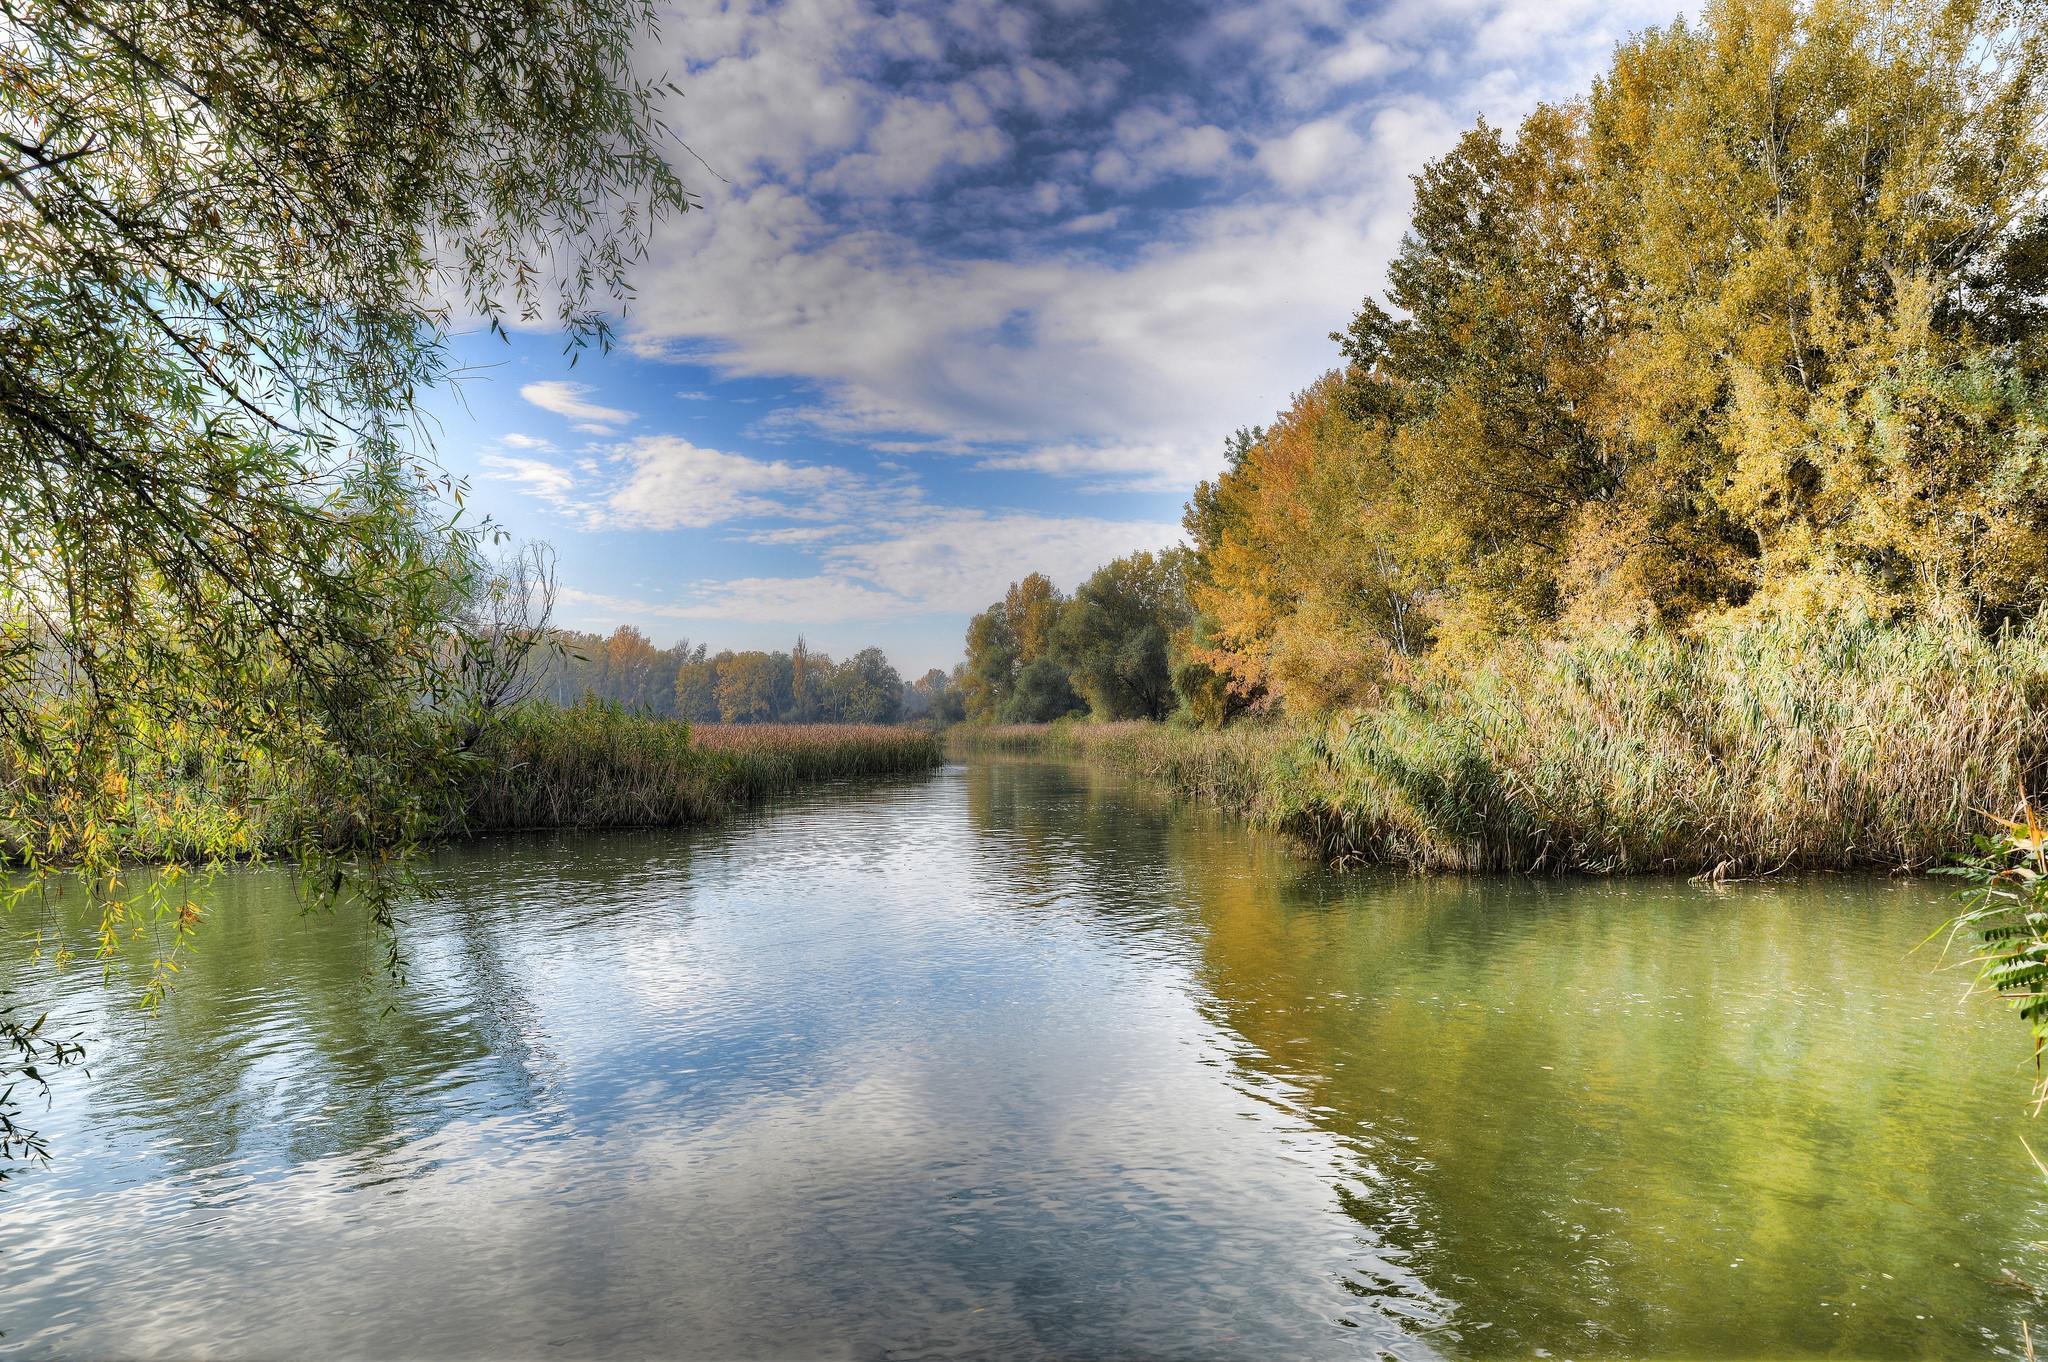 обои Озеро Тиса, Венгрия, осень, деревья картинки фото